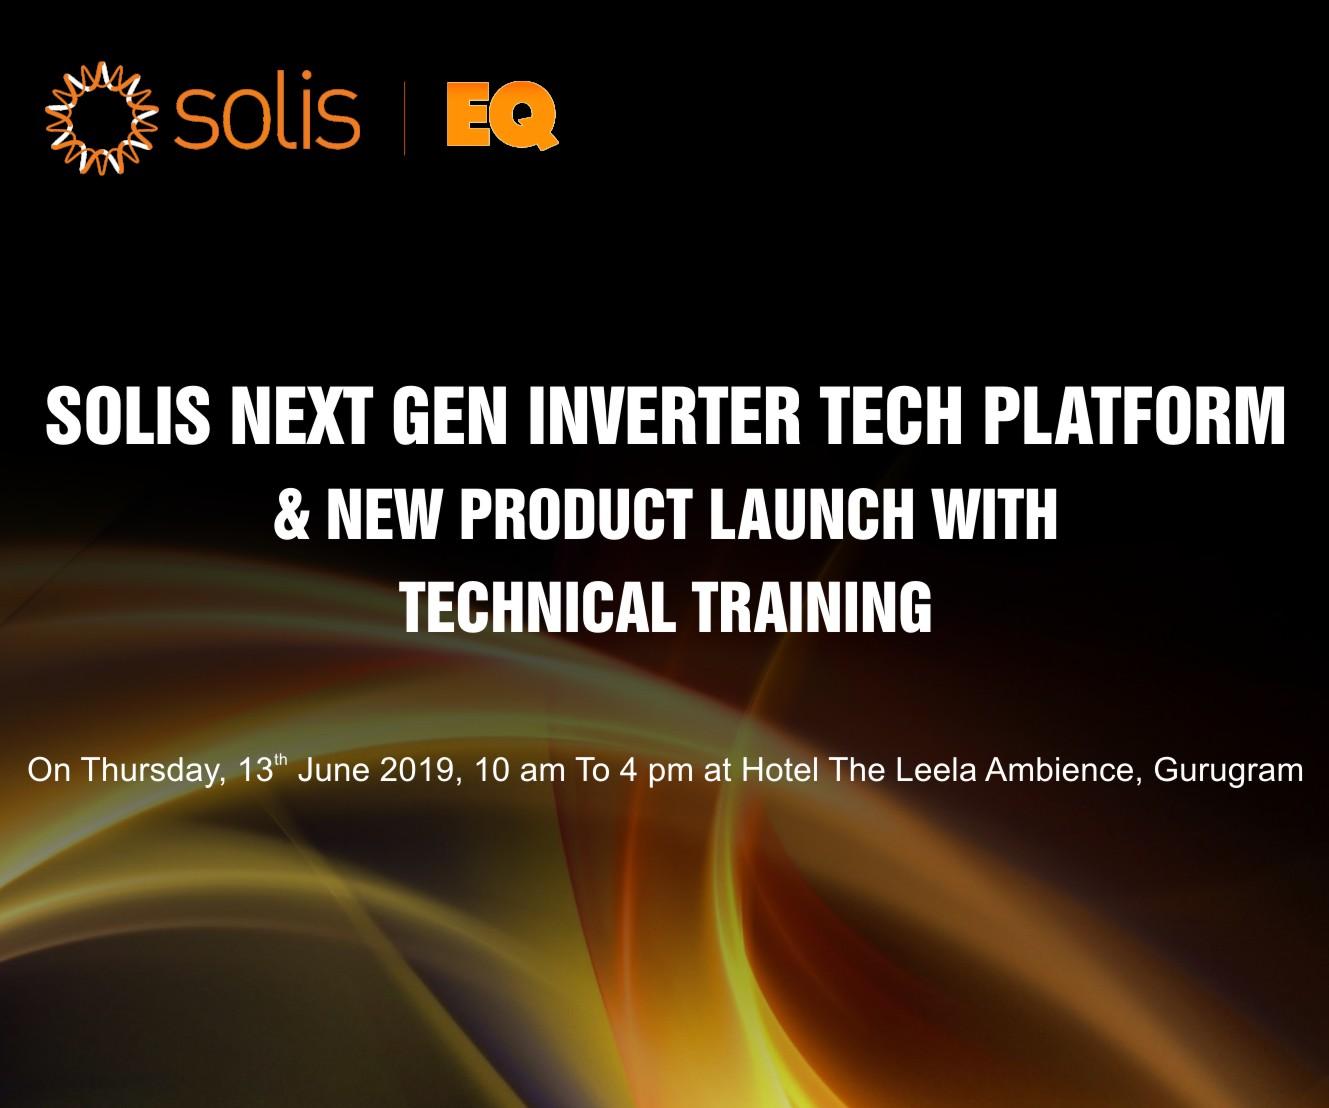 Solis Next Gen Inverter Tech Platform & New Product Launch